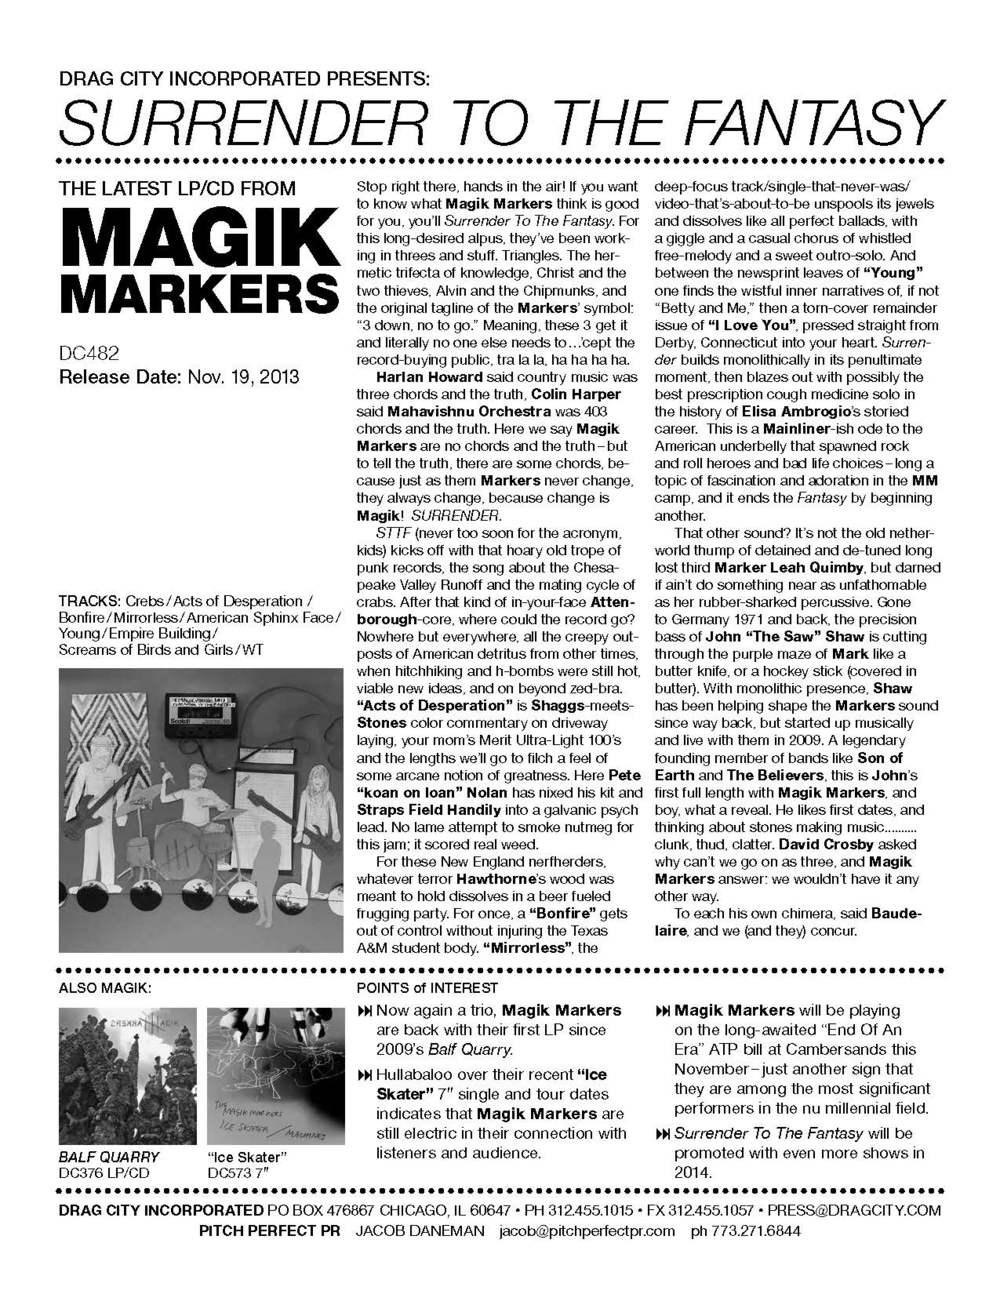 MagikMarkers_SurrenderToTheFantasy_PROMO (1).jpg